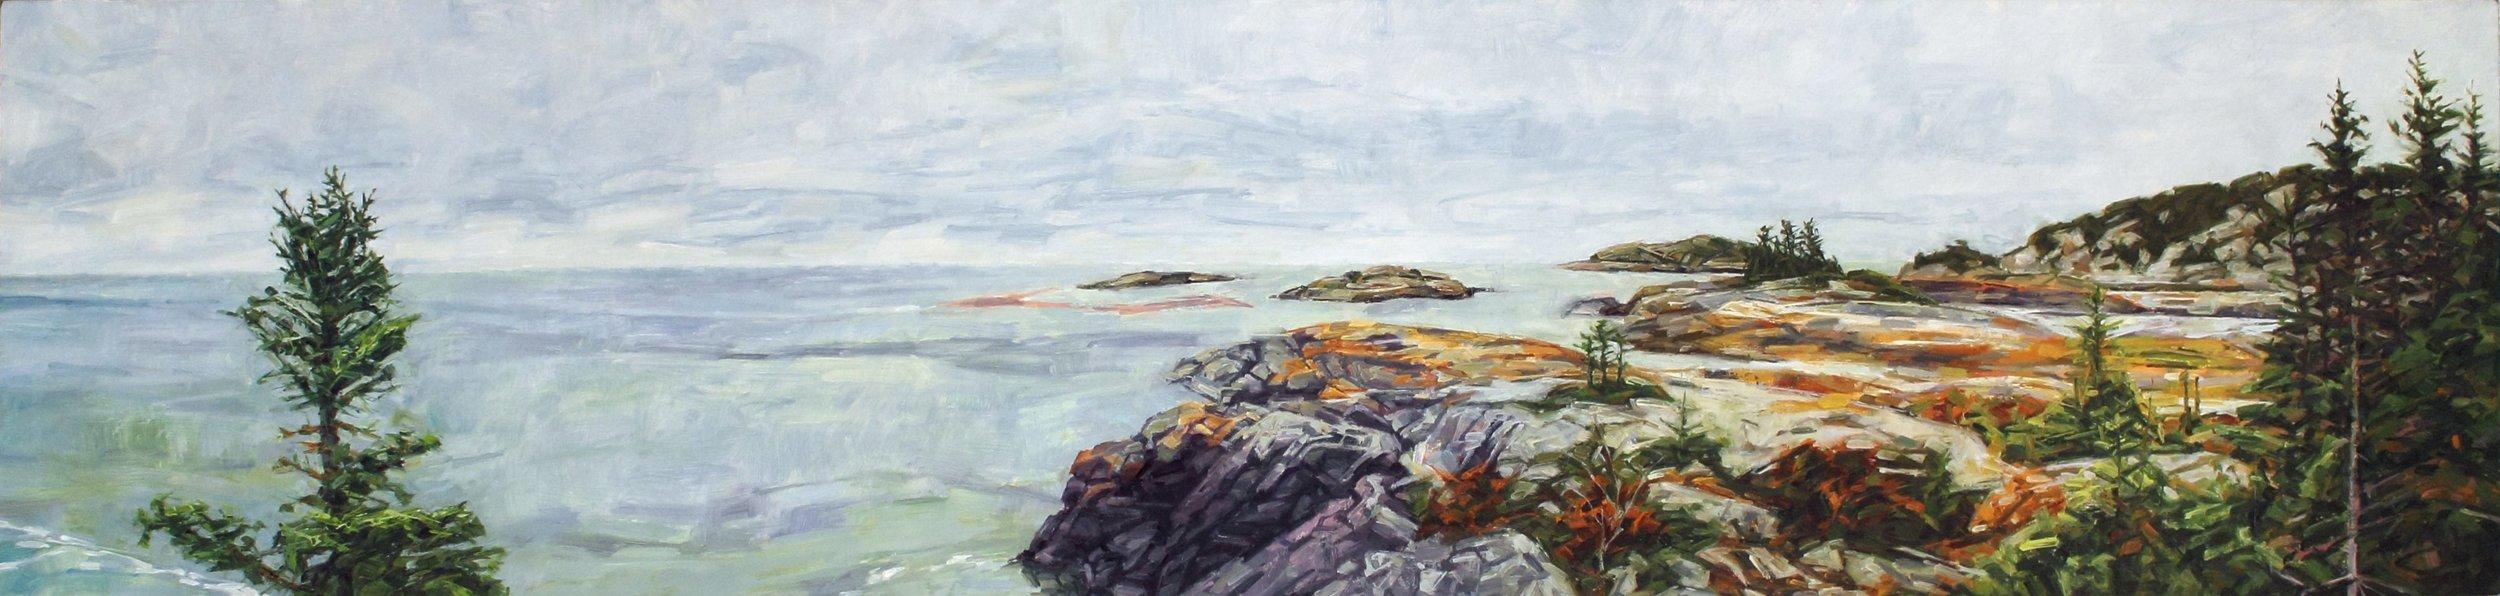 Northern Landscape I-Ragueneau